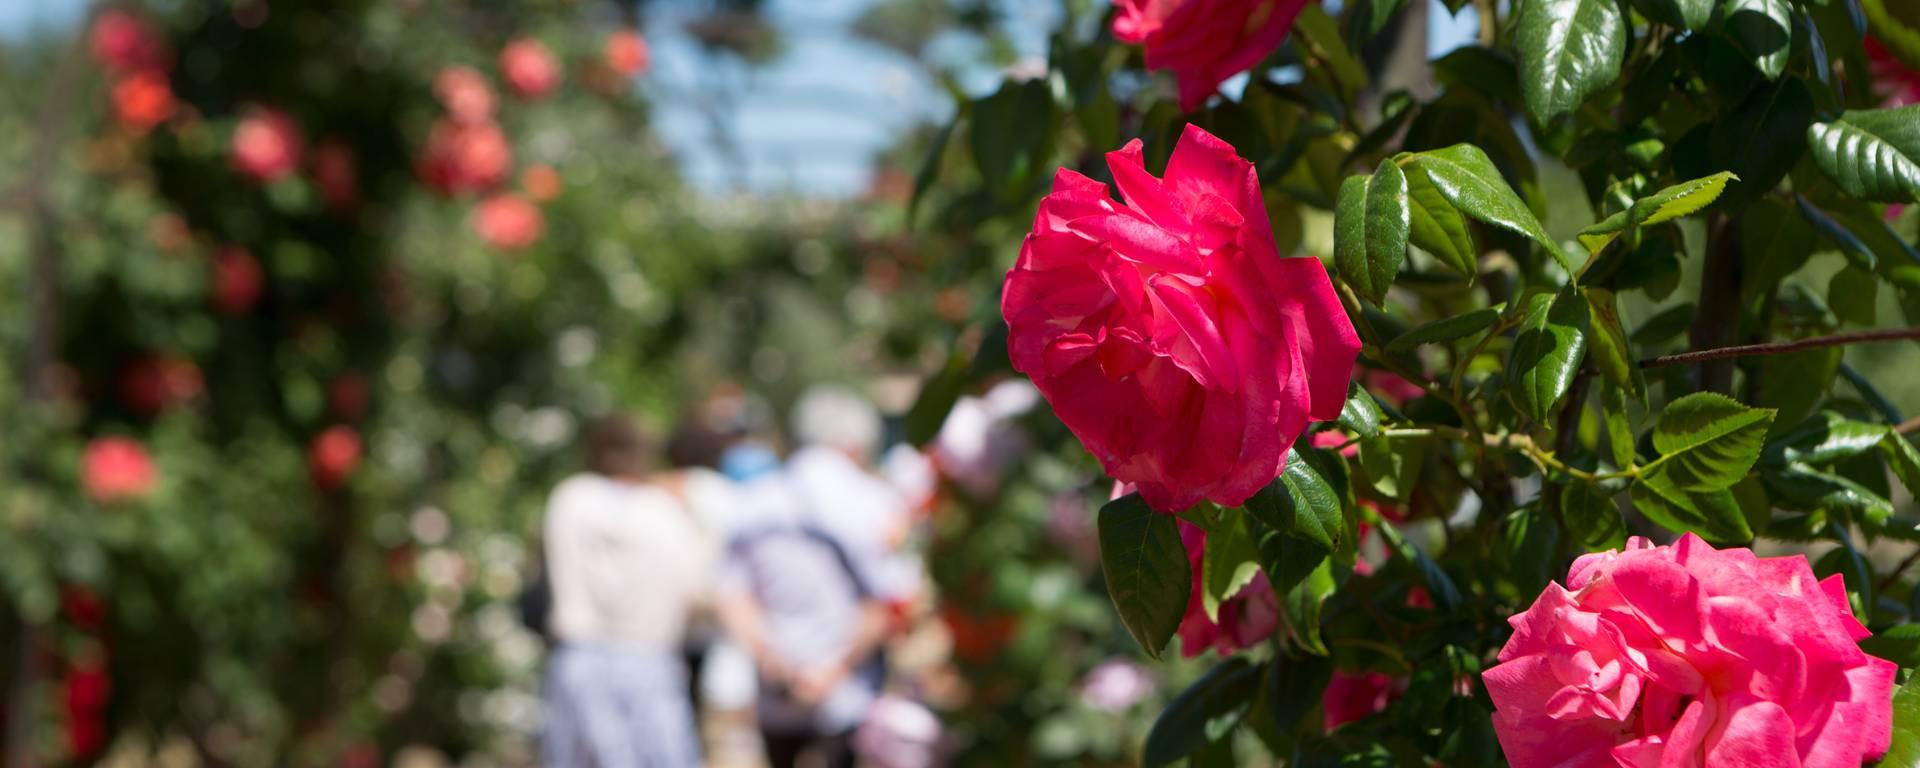 Rose garden of Eilenroc villa ©Mairie d'Antibes - J. Bayle